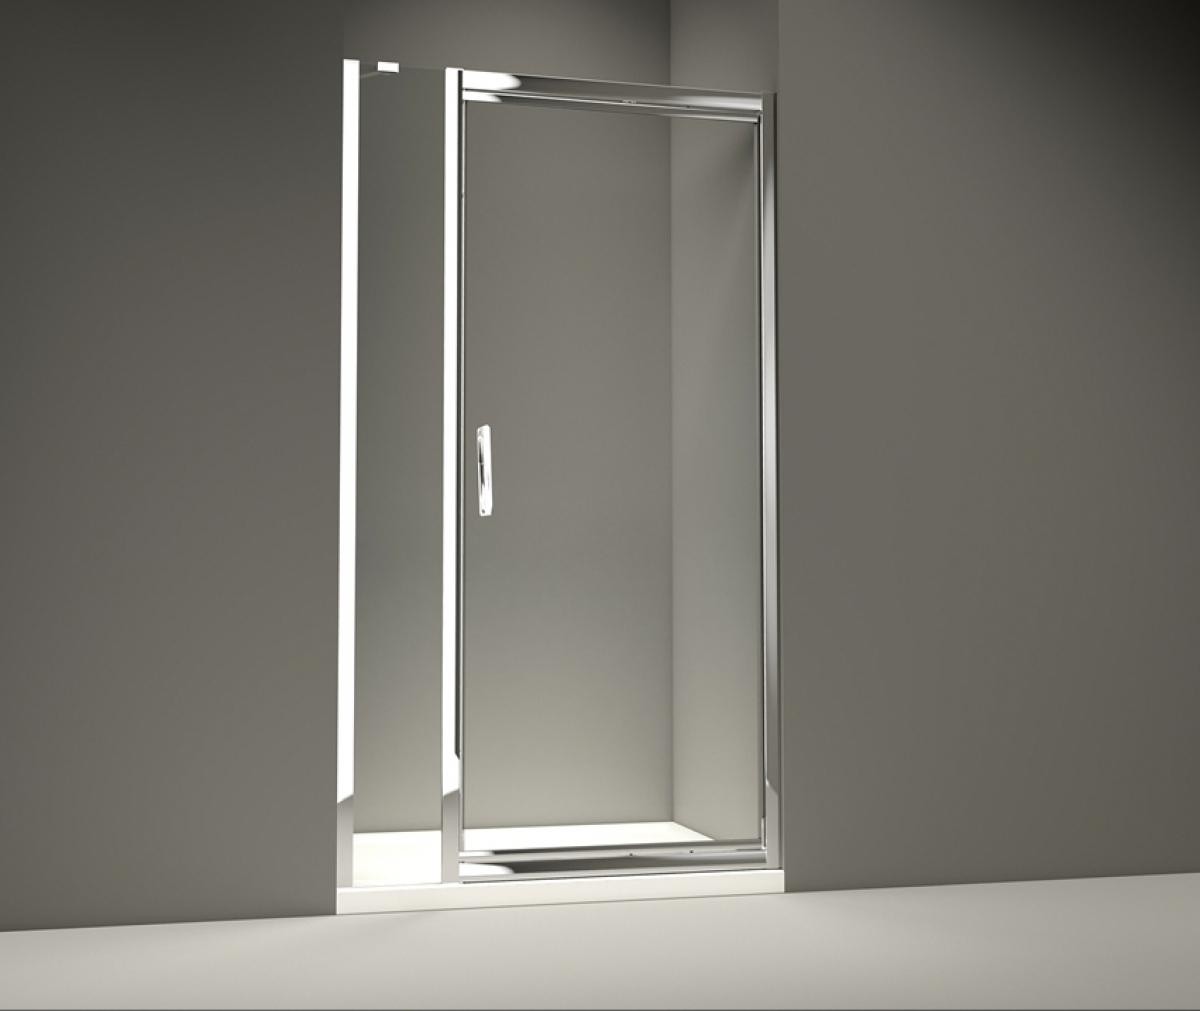 Merlyn 8 series 800mm 2 door quadrant shower enclosure - Merlyn Series 8 Shower Enclosures